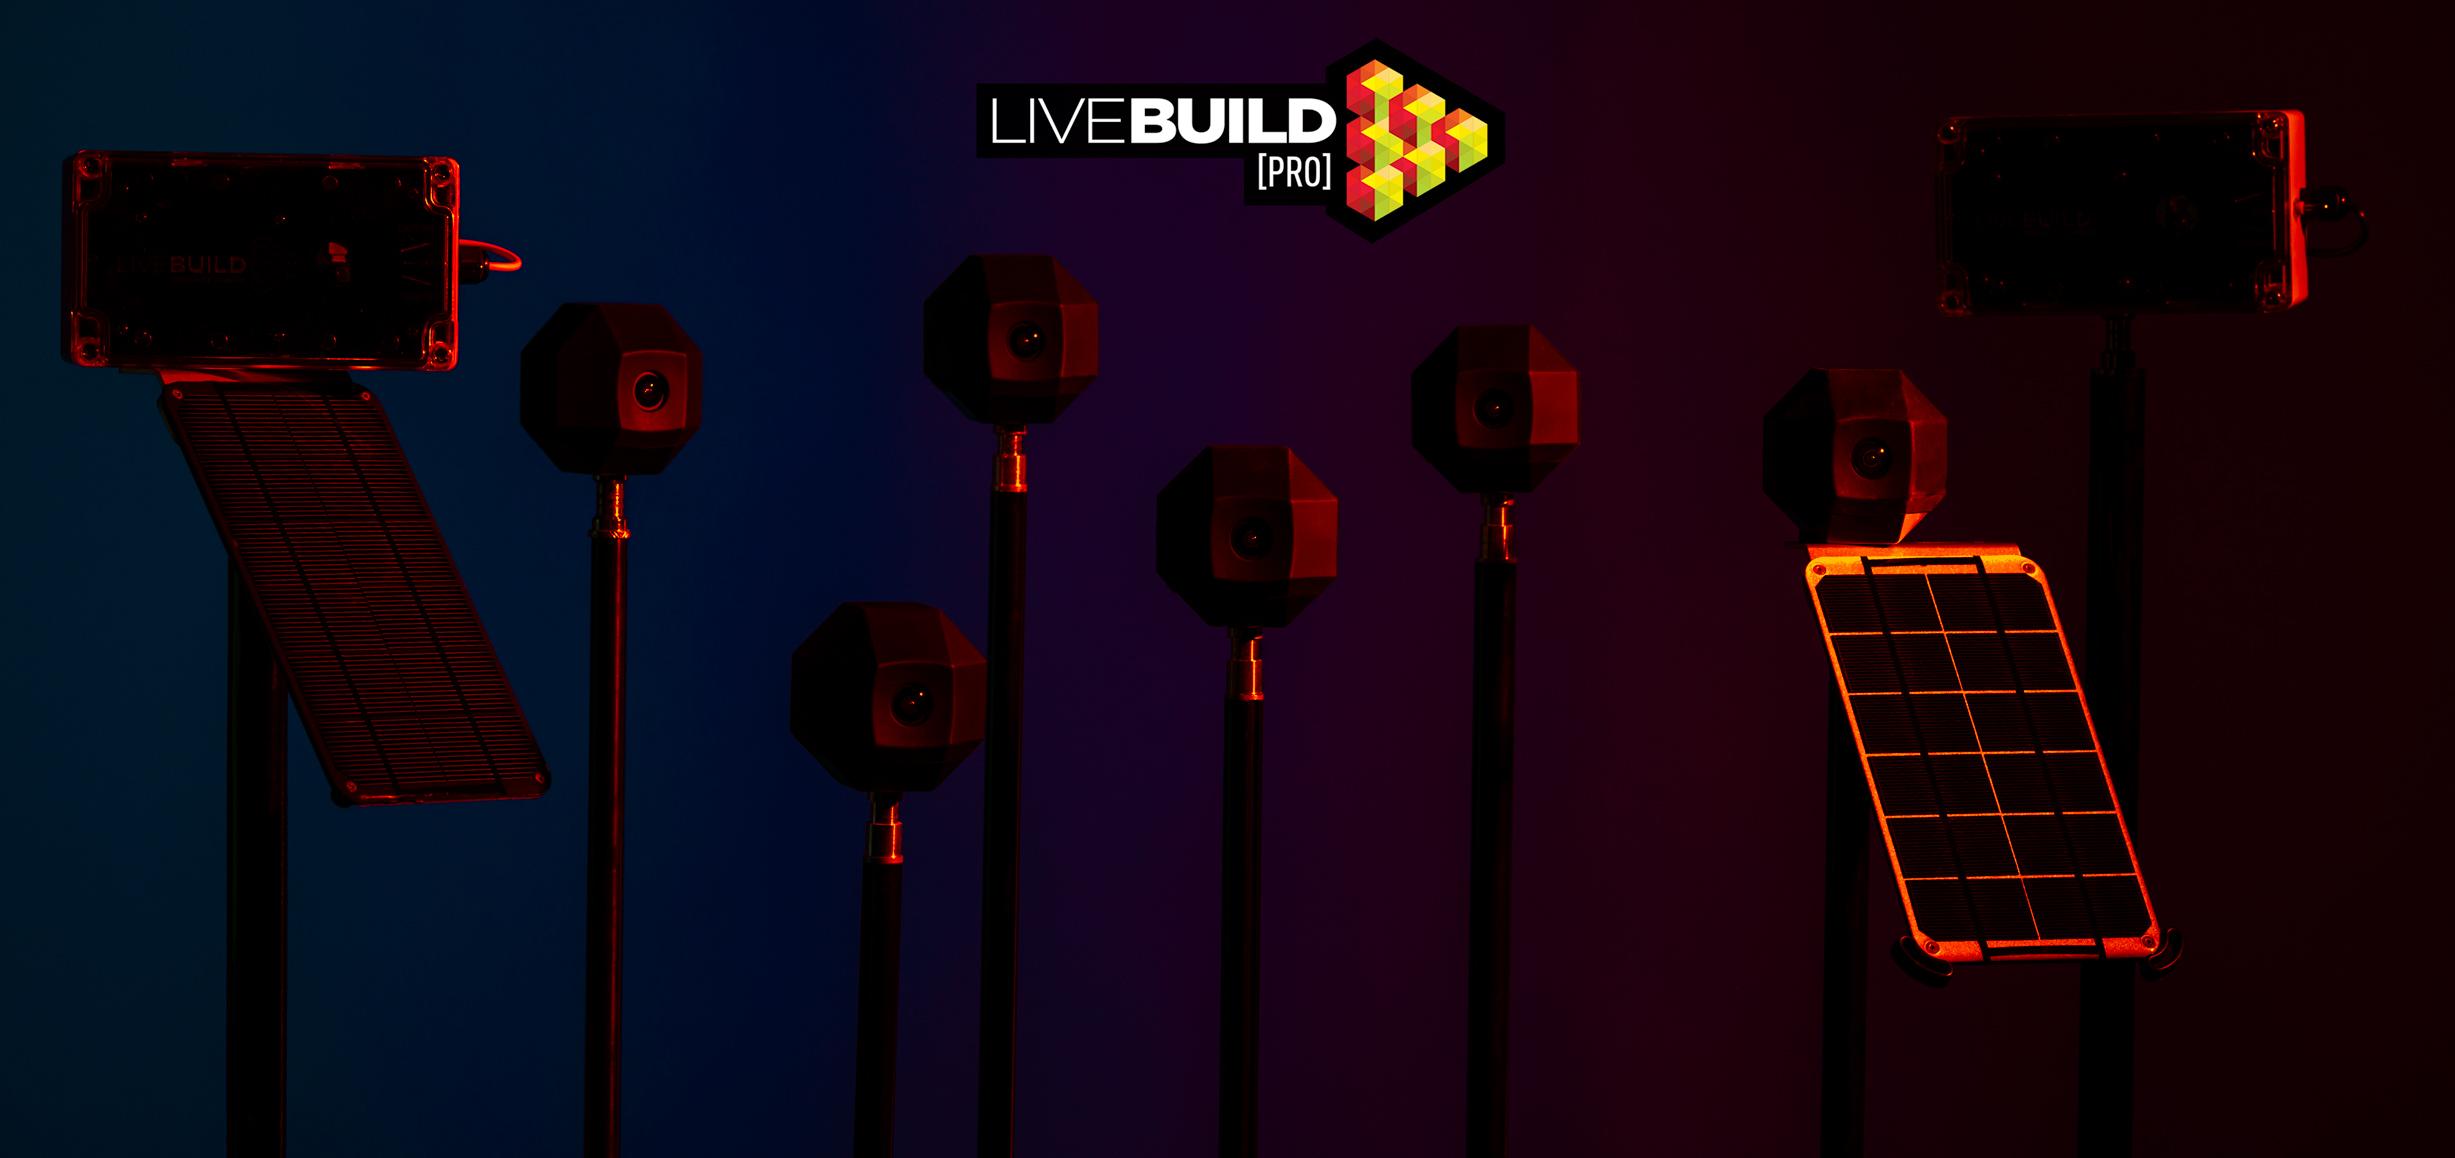 livebuildpro-stealthcams-wide.jpg